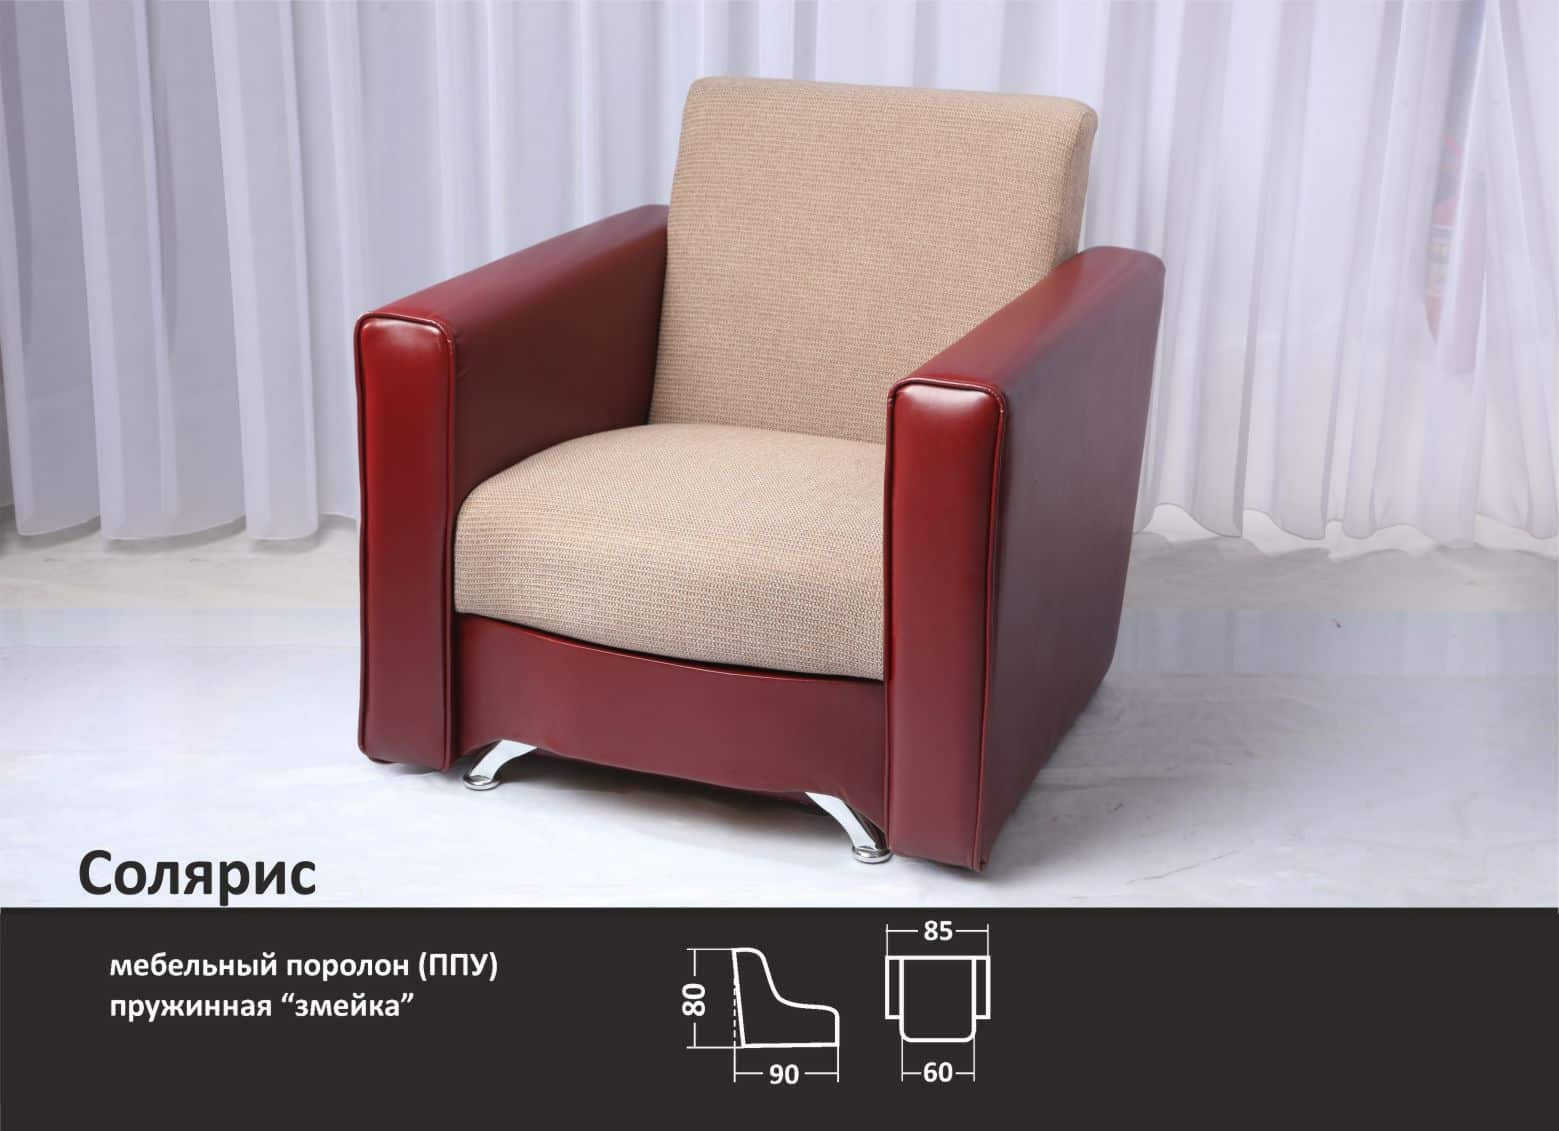 Кресло Солярис (не разборное)